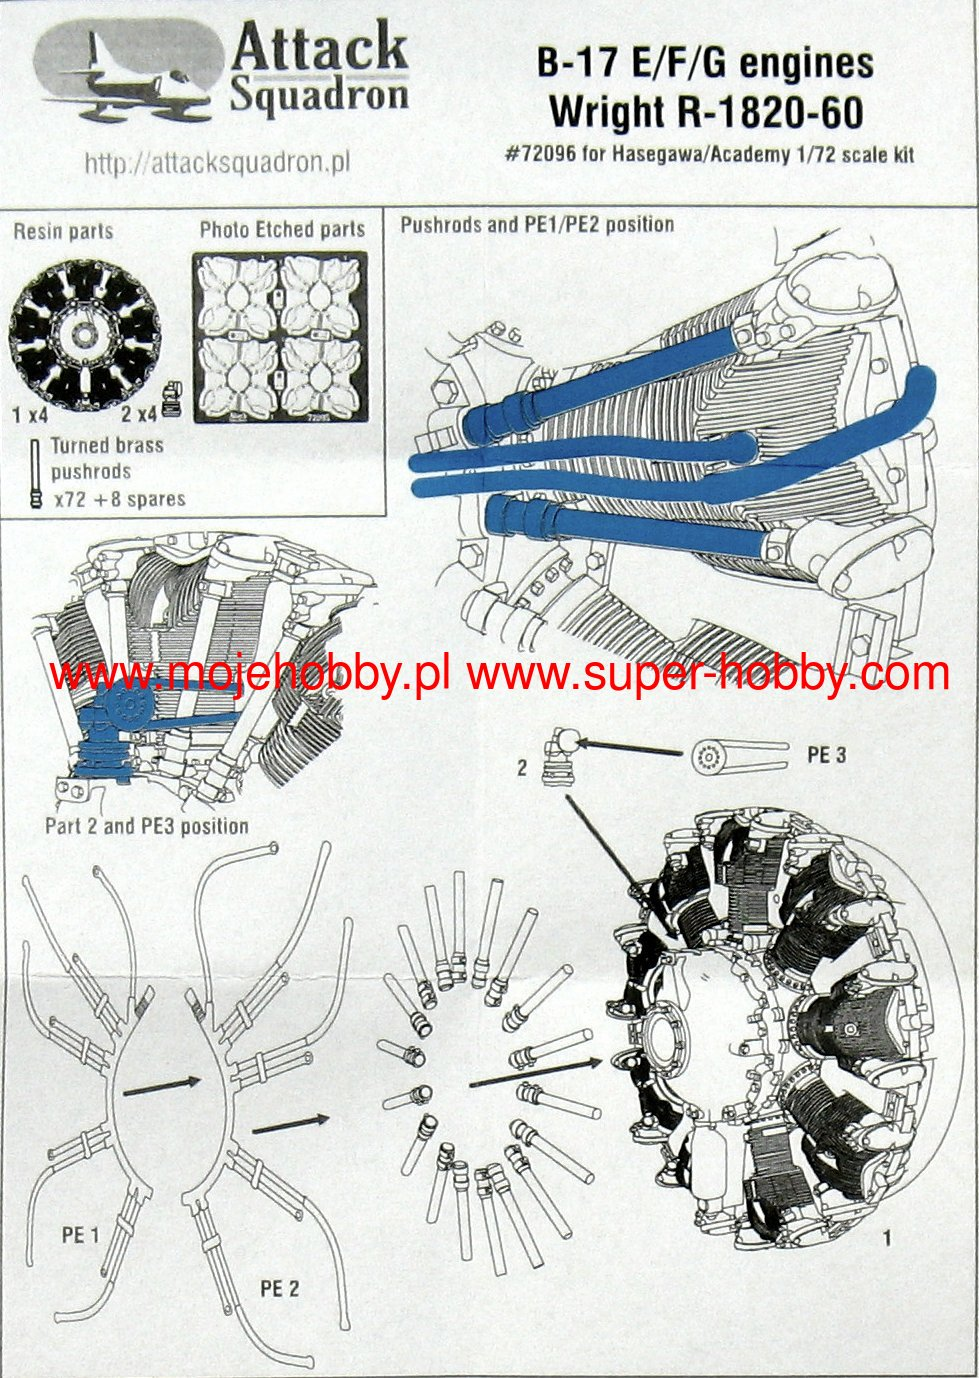 B 17 Engine Diagram - Wiring Diagram World B Engine Diagram on b-17 cutaway view, b-17 manual, b16a block diagram, cyclone diagram, integra radio diagram, b 17 bomber diagram, b16a2 head diagram, b-17 blueprints, b-17 flying fortress, b-17 drawings to scale dwg, b-24 diagram, b-17 pencil drawings, b-29 superfortress bomber diagram, 91 integra hoses diagram, 93 honda civic obd diagnosis diagram, b-17 production, b-17 engines and superchargers, 2004 toyota tacoma stereo wiring diagram, 95 accord radio harness diagram,